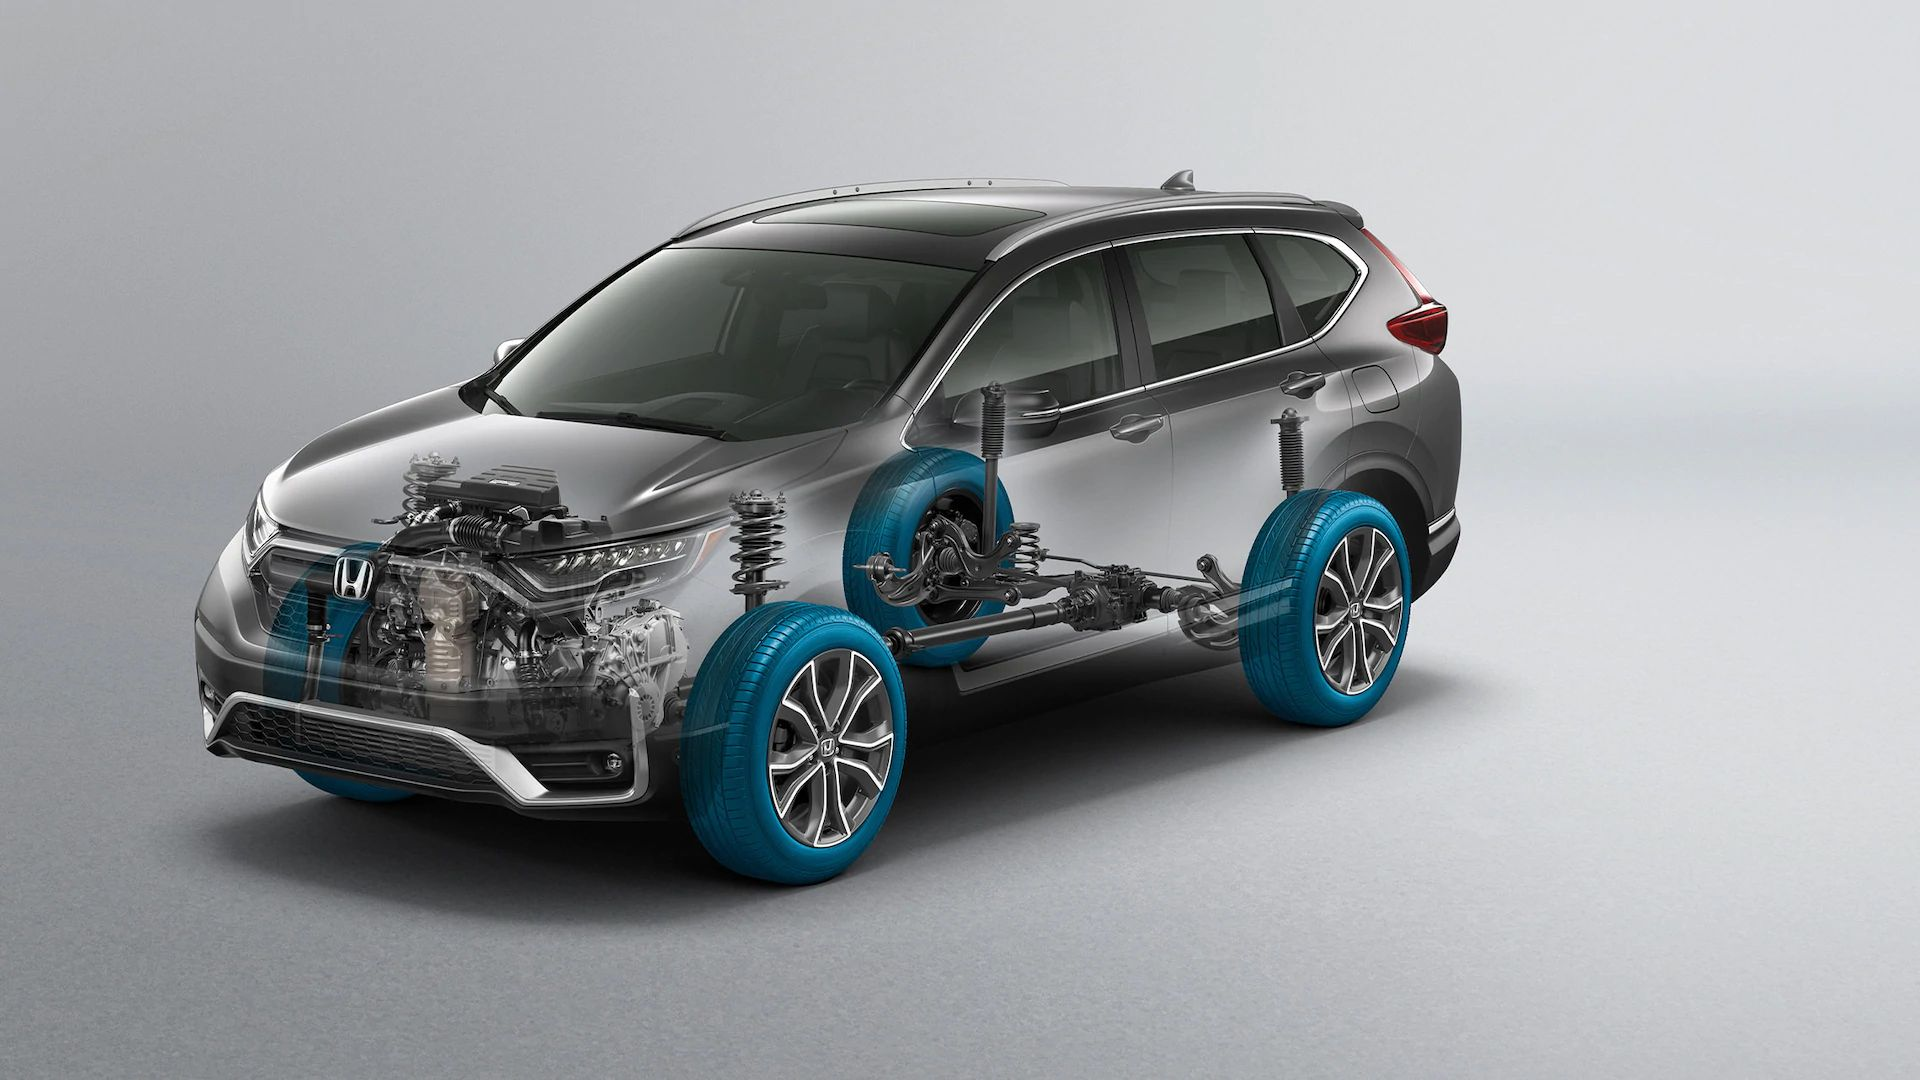 New 2020 Honda CR-V LX Trim and Features